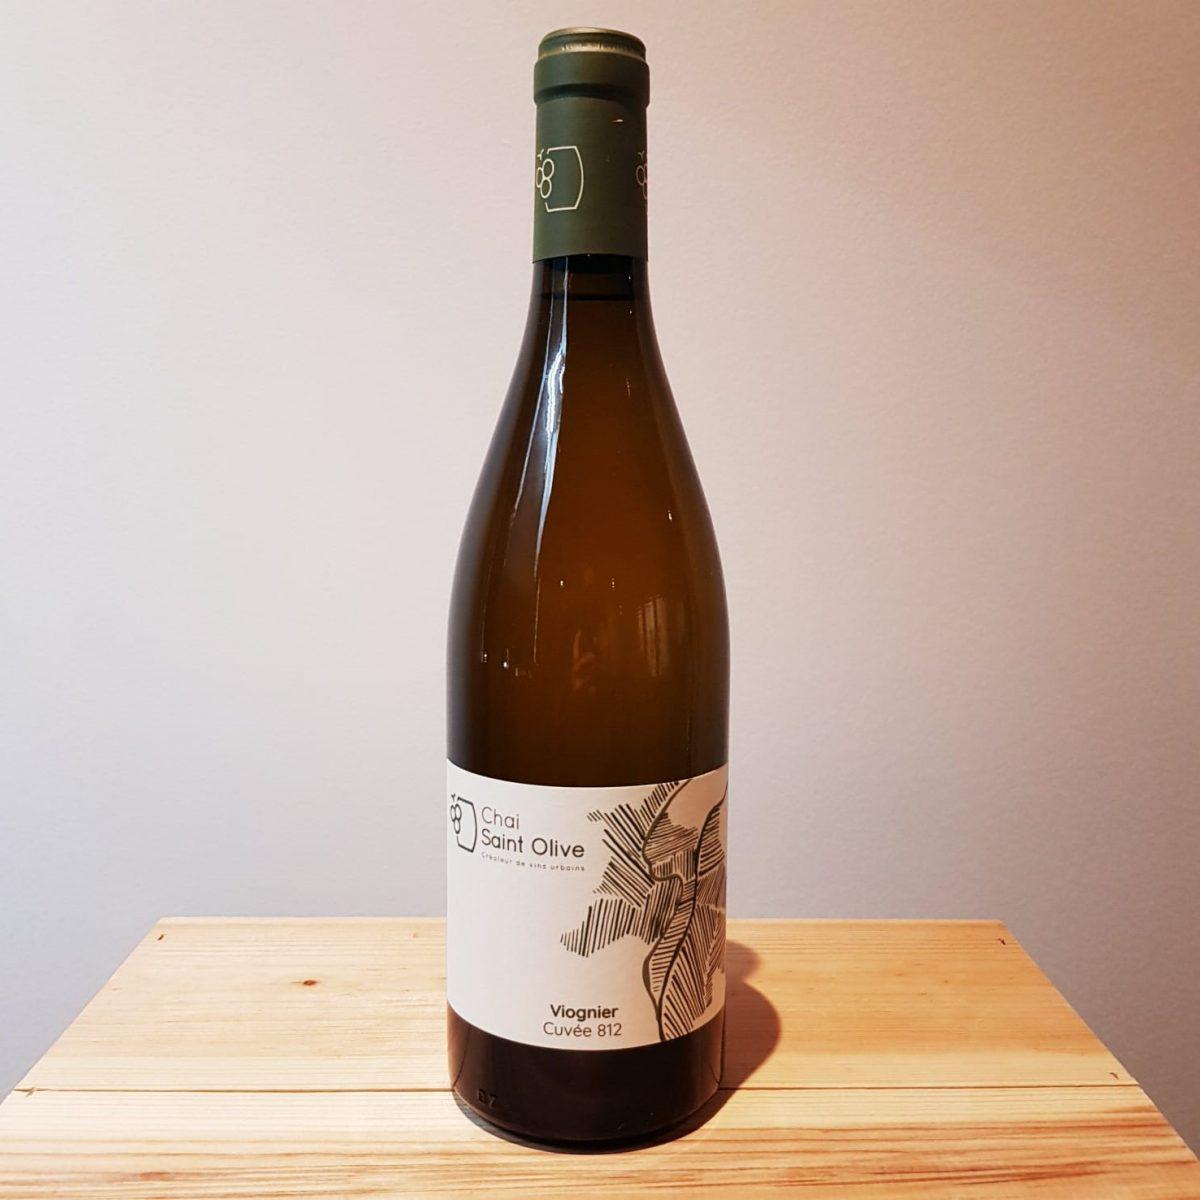 chai saint olive viognier 812